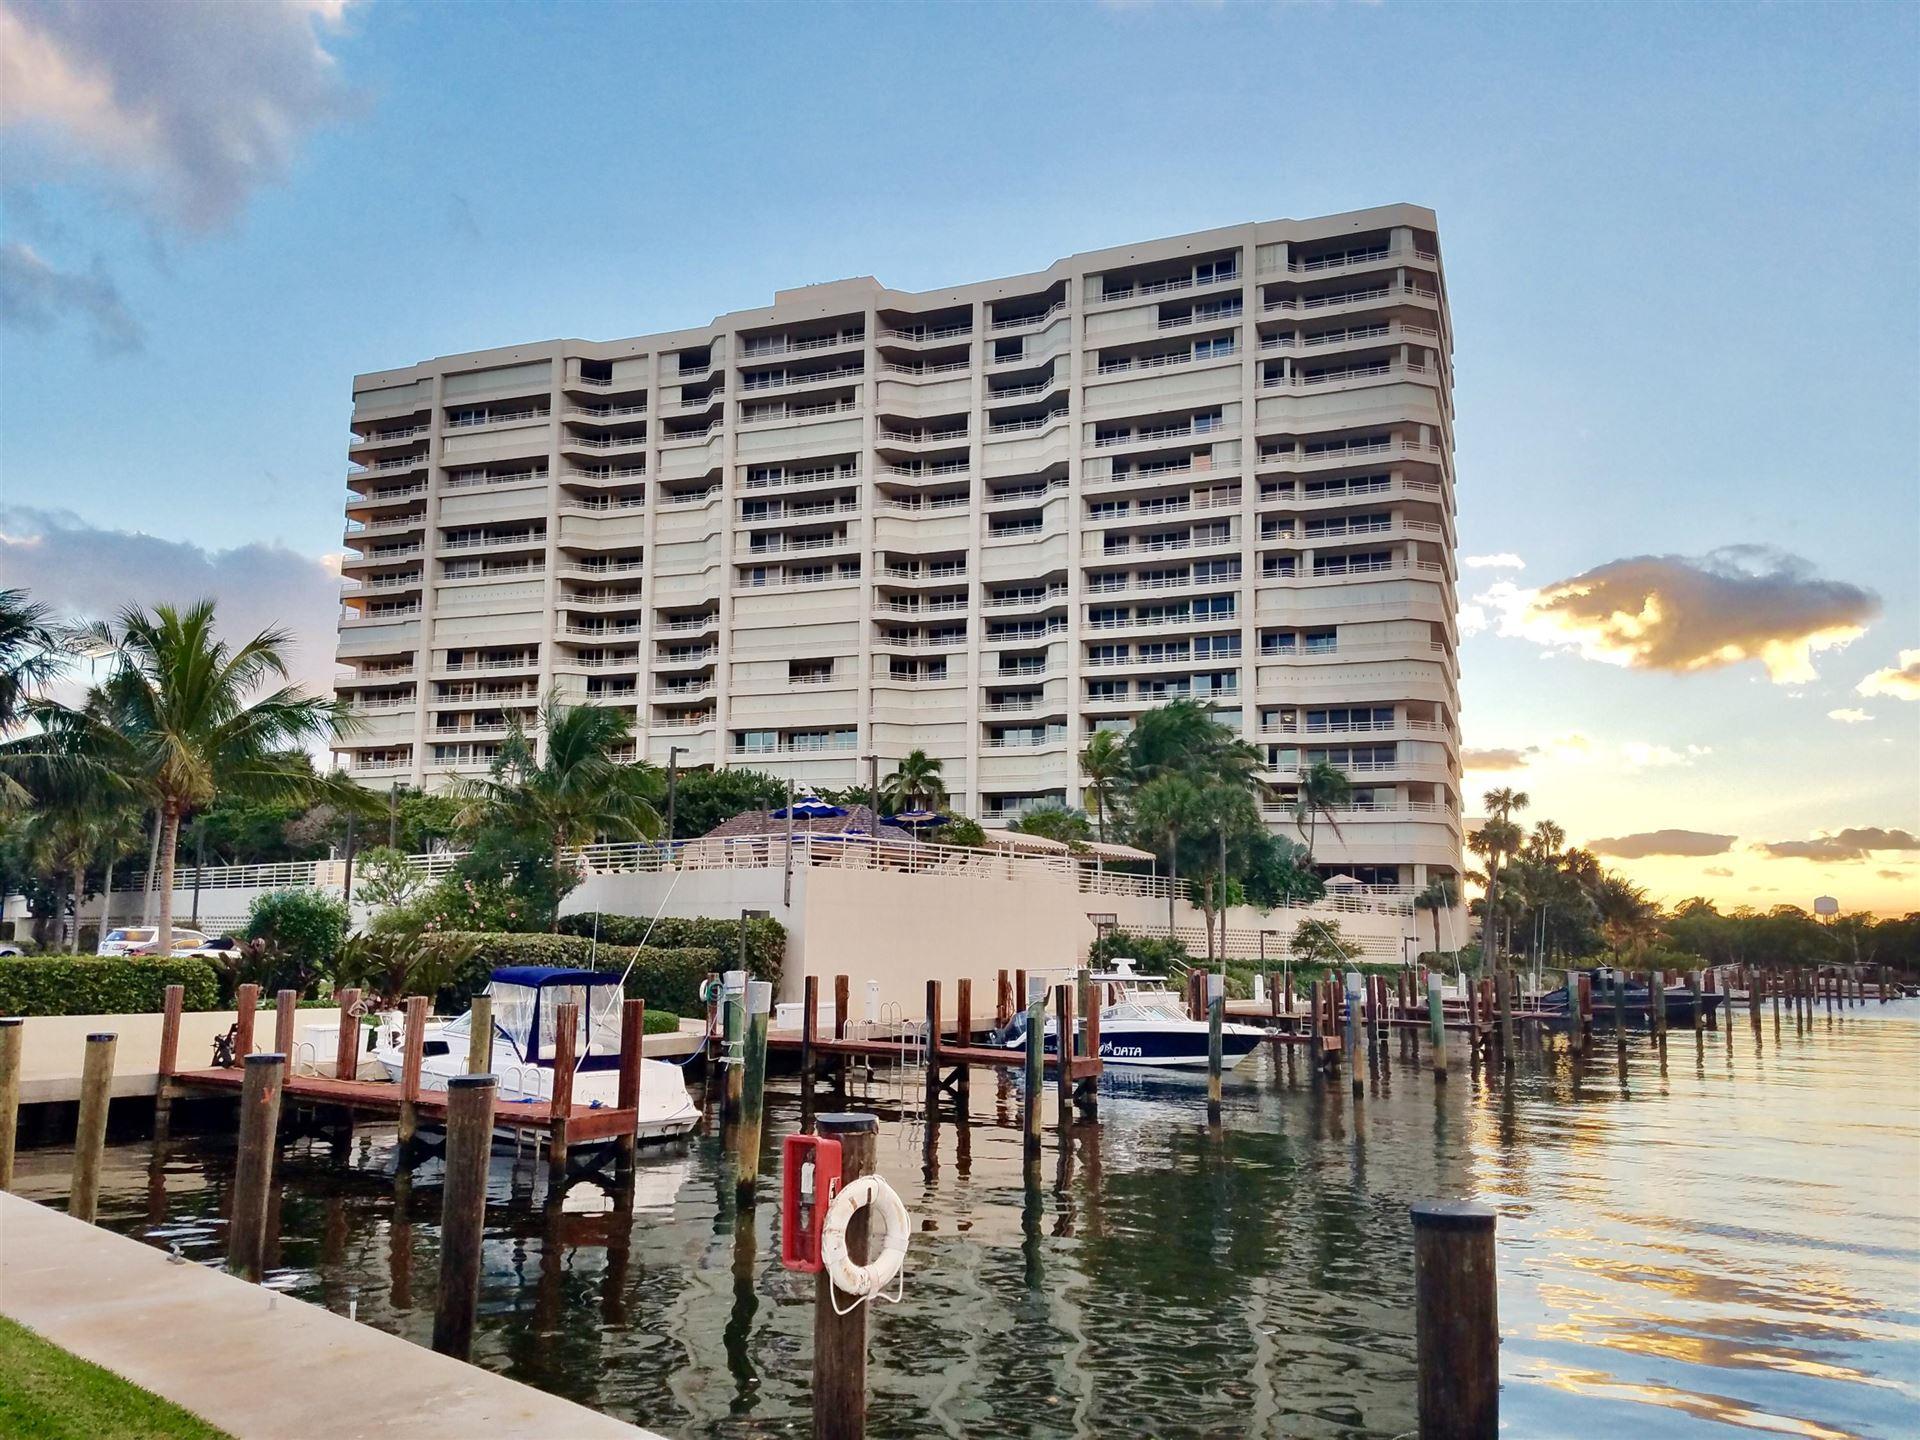 4101 N Ocean Boulevard #D-1608, Boca Raton, FL 33431 - #: RX-10601037